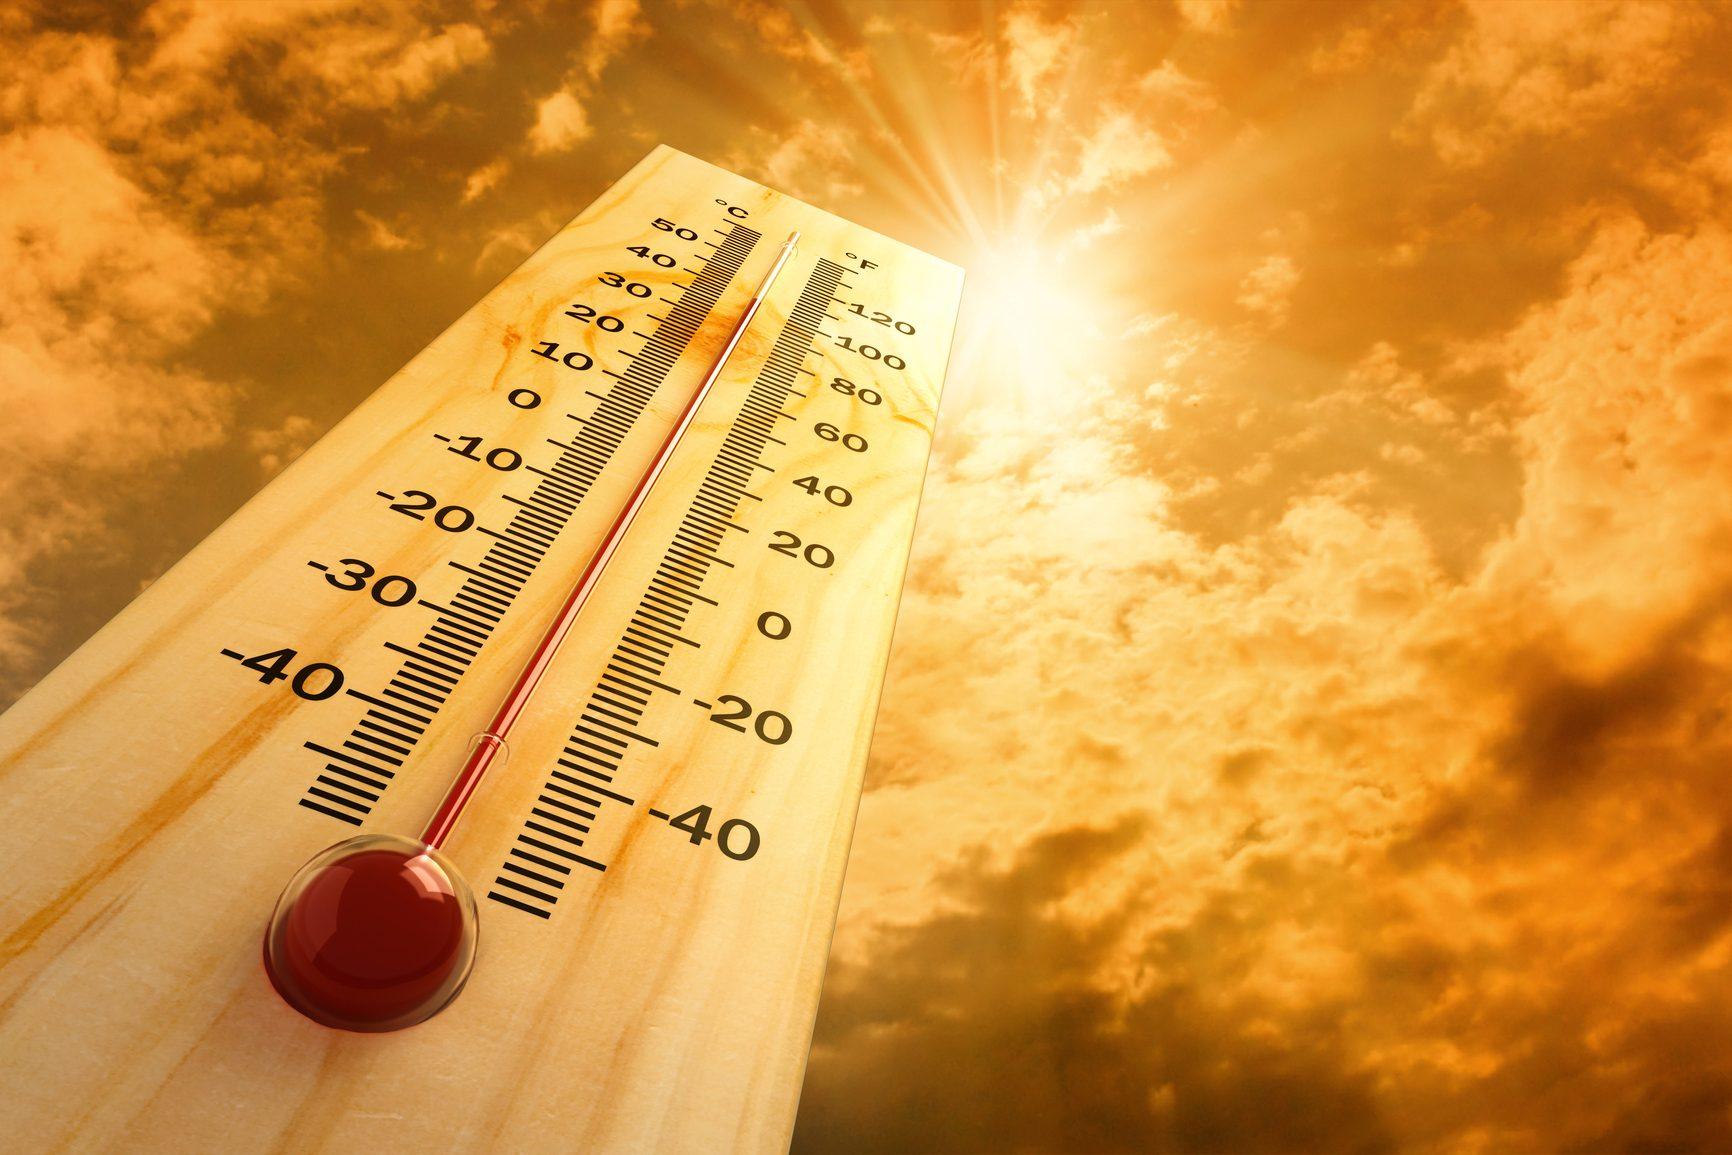 Cuaca Panas - Hot Weather